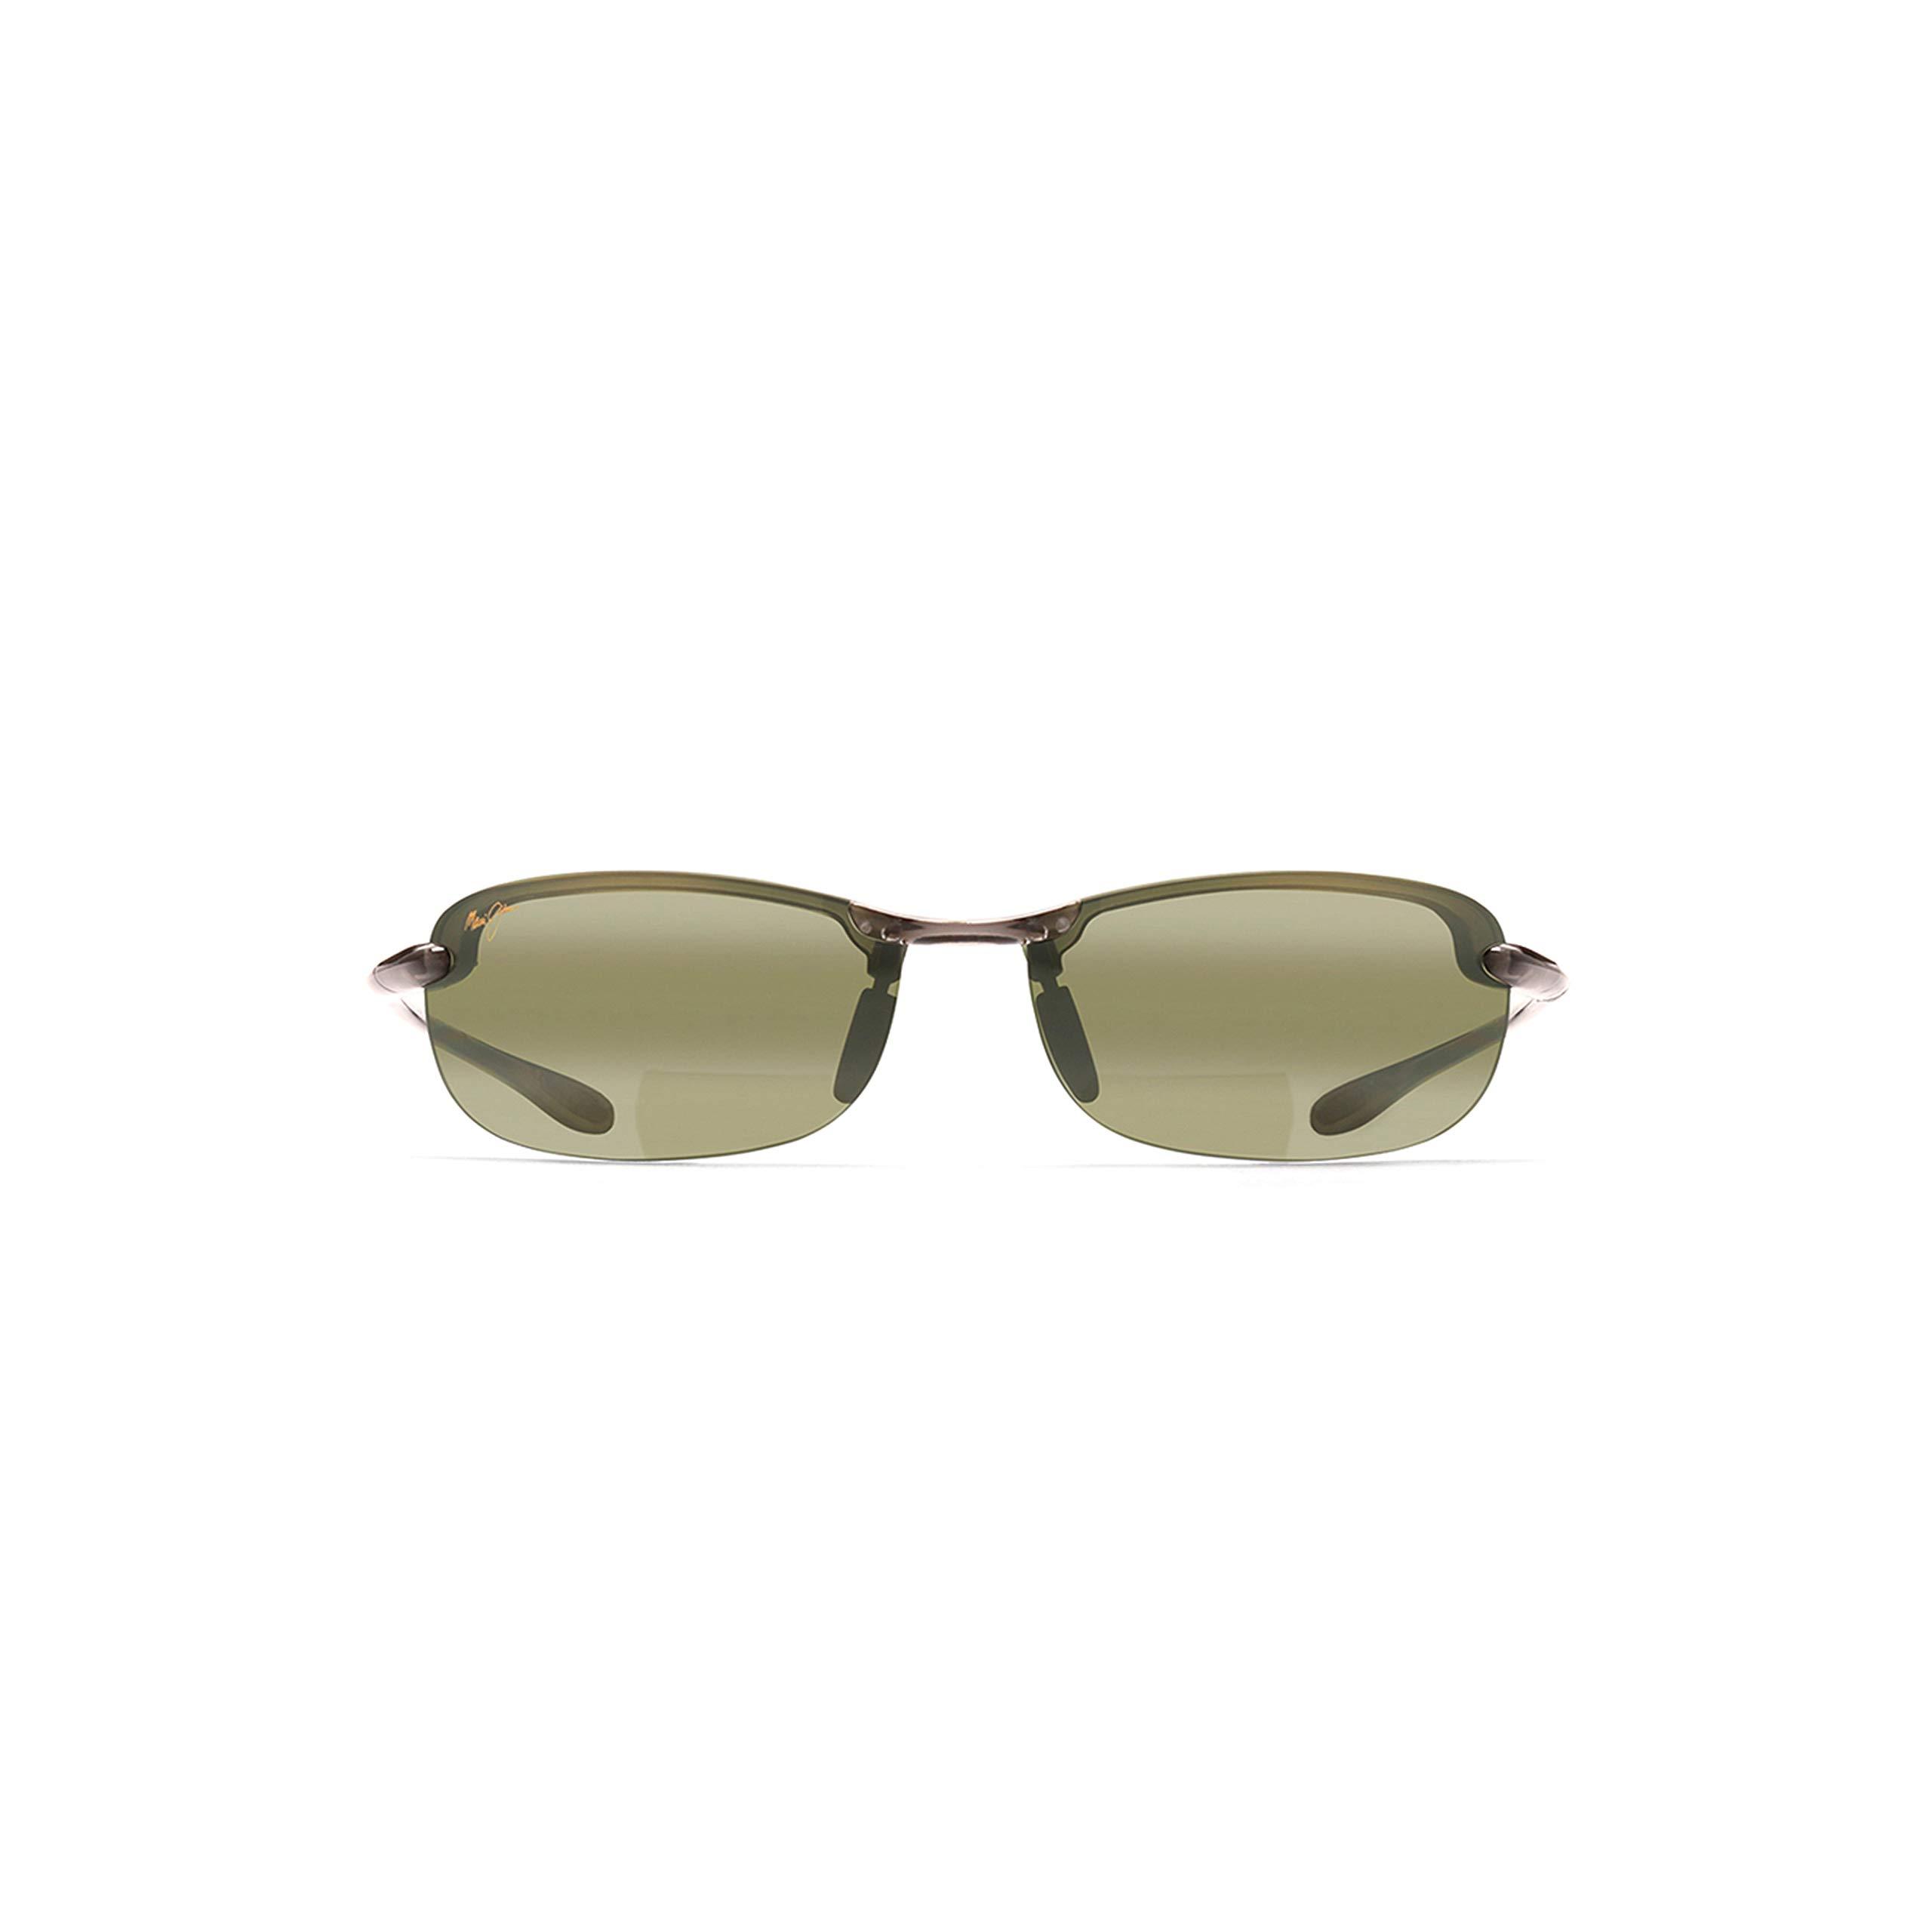 Maui Jim Makaha Reader HT805-1120 | Polarized Smoke Grey Rimless Frame Sunglasses, Maui HT Lenses, with with Patented PolarizedPlus2 Lens Technology 2 by Maui Jim